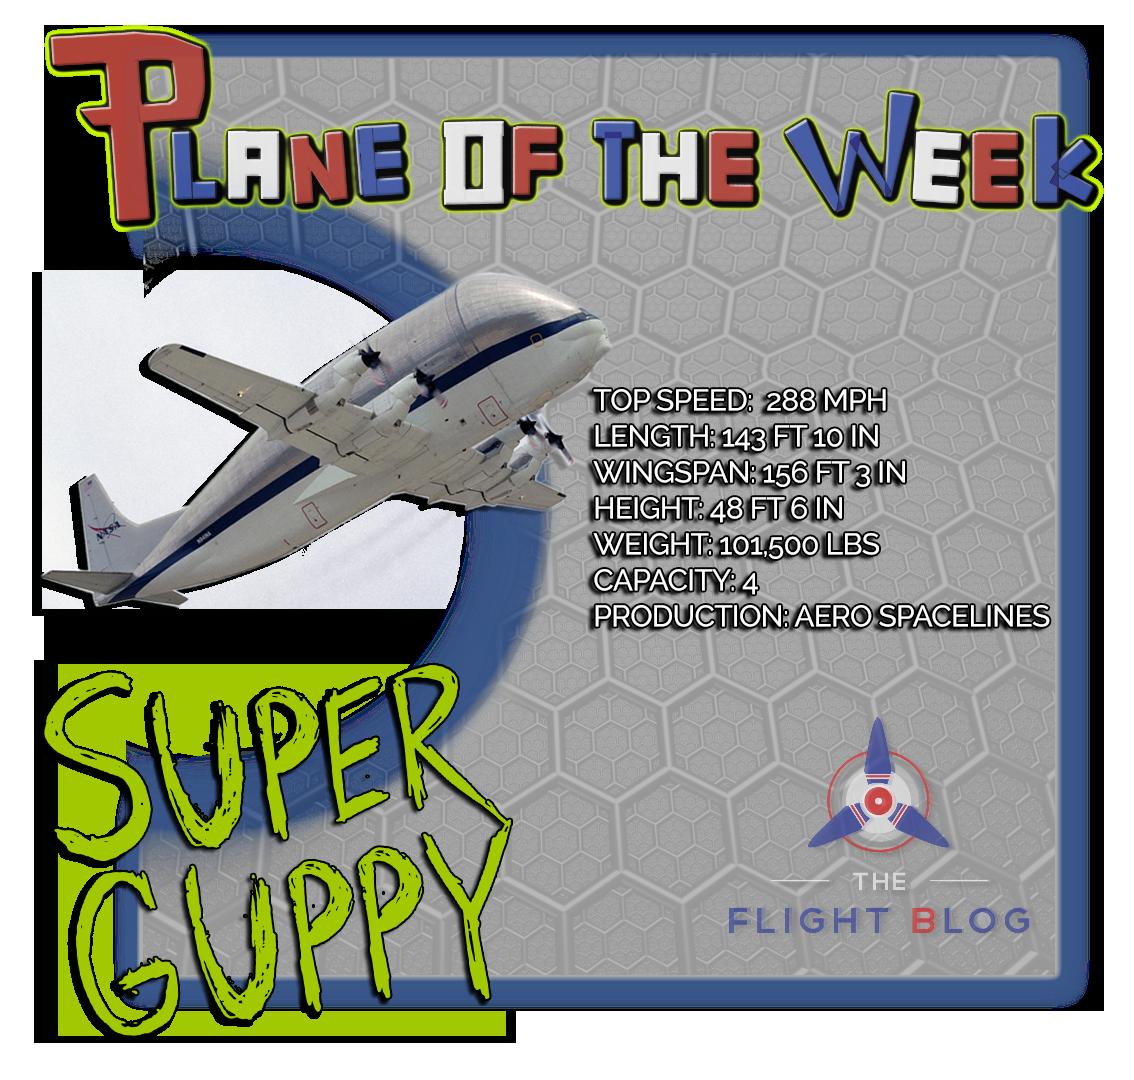 super guppy, NASA, super guppy turbine, plane of the week, plane specs, super guppy specs, the flight blog, aviation oil outlet, aero spacelines super guppy, NASA super guppy